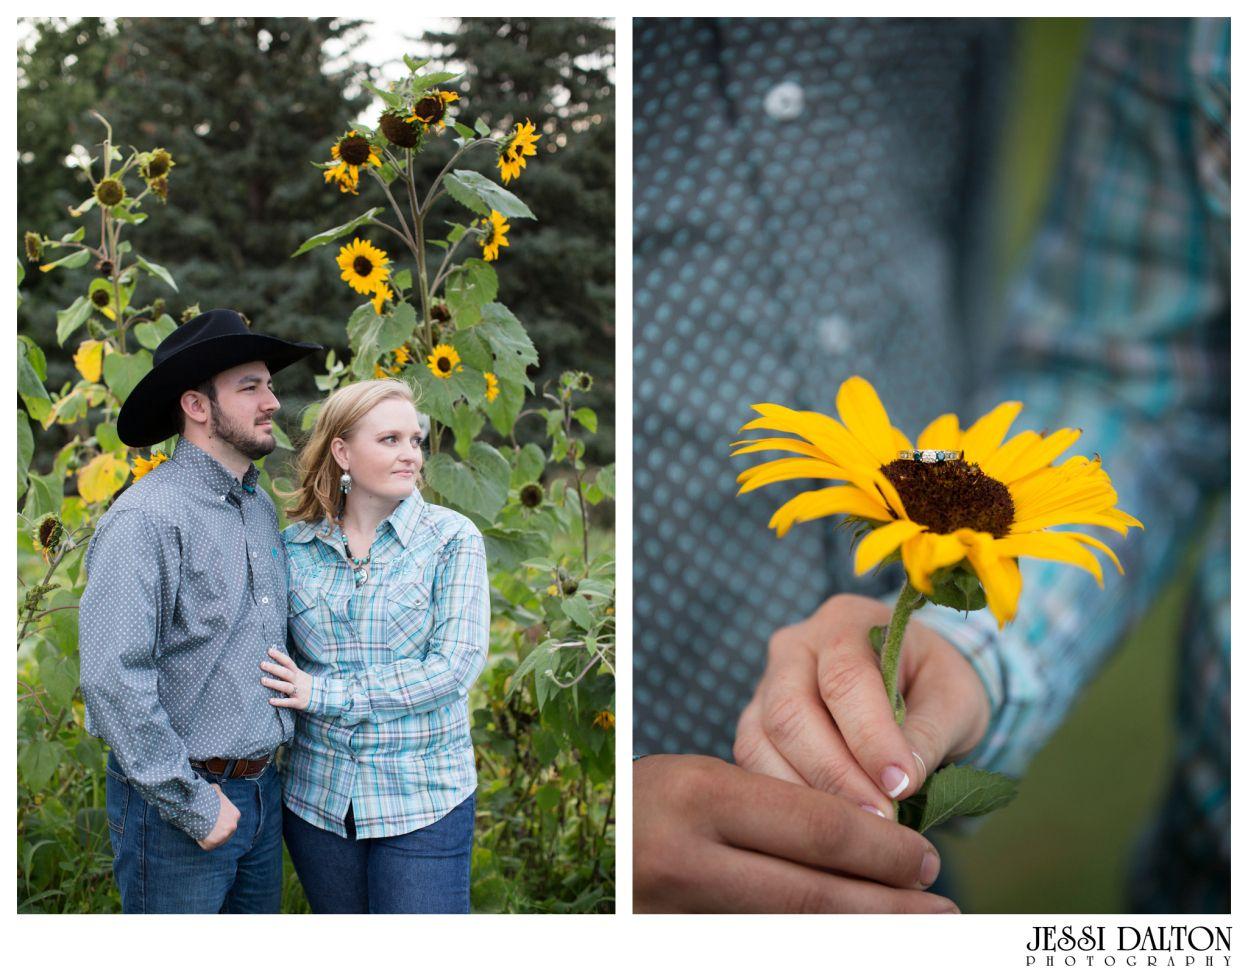 Country Engagement Session at Rock Ledge Ranch in Colorado Springs, Colorado | Jessi Dalton Photography | www.jessidalton.com